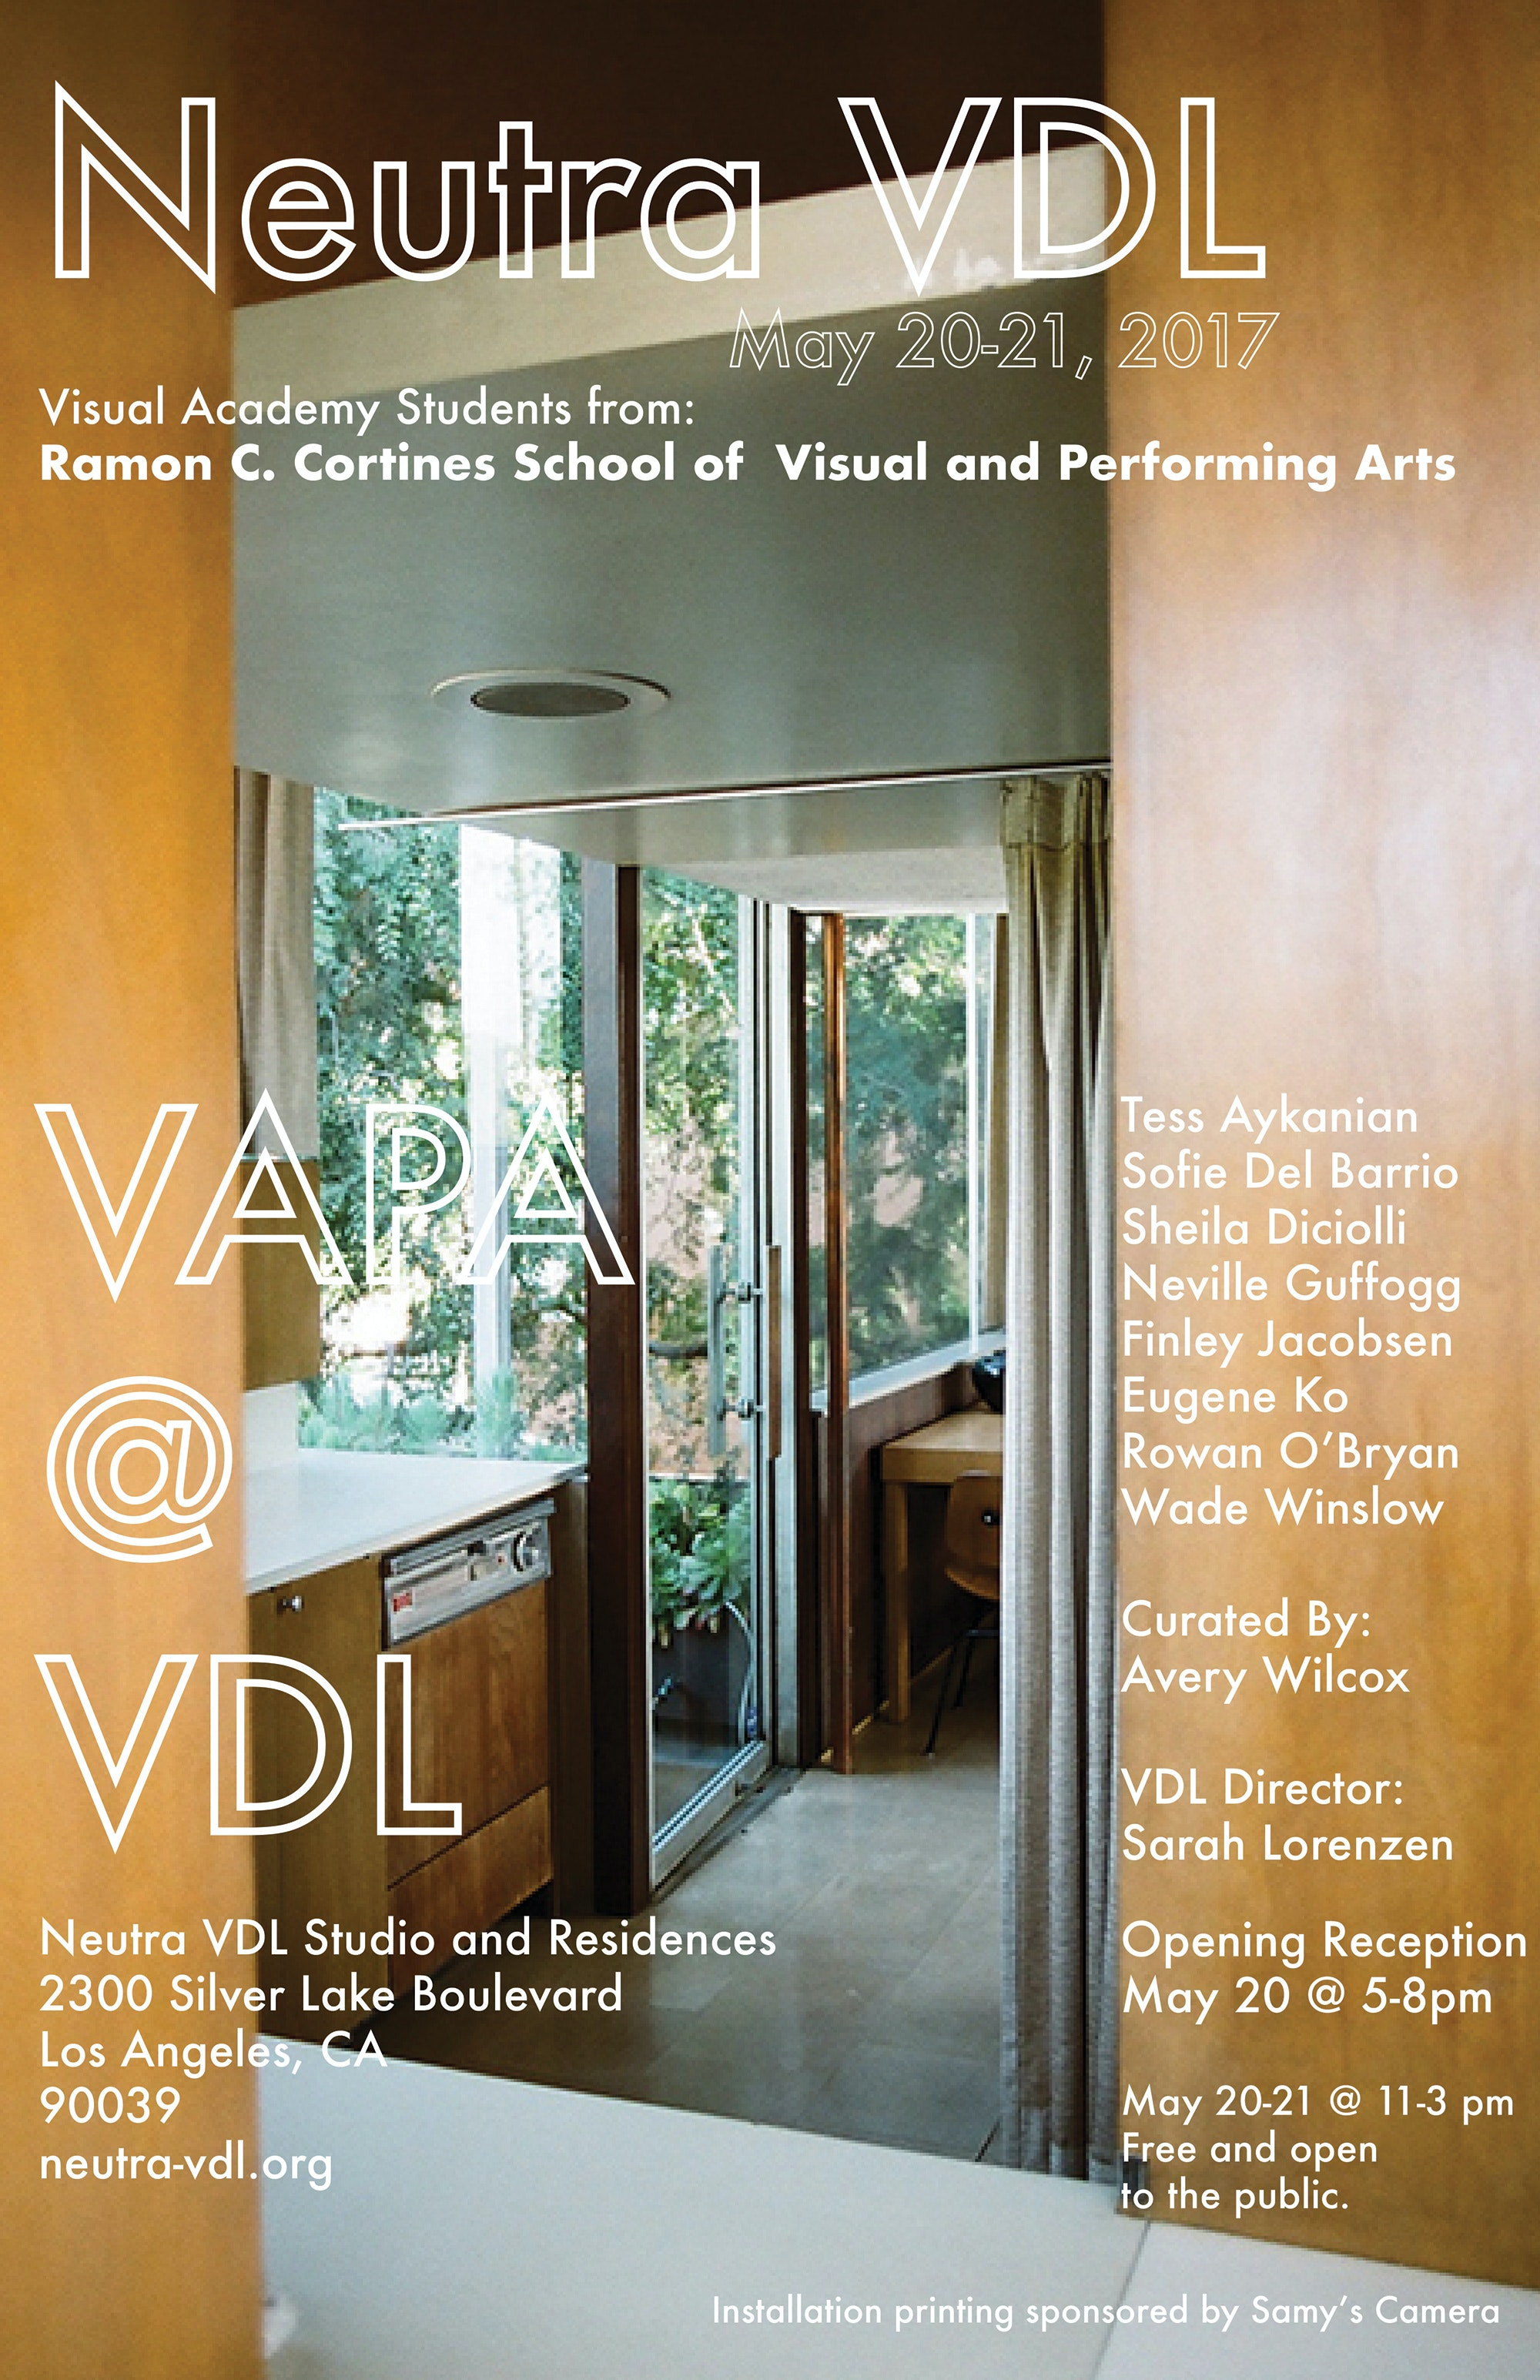 High School Students Interpret Neutrau0027s VDL House With Art